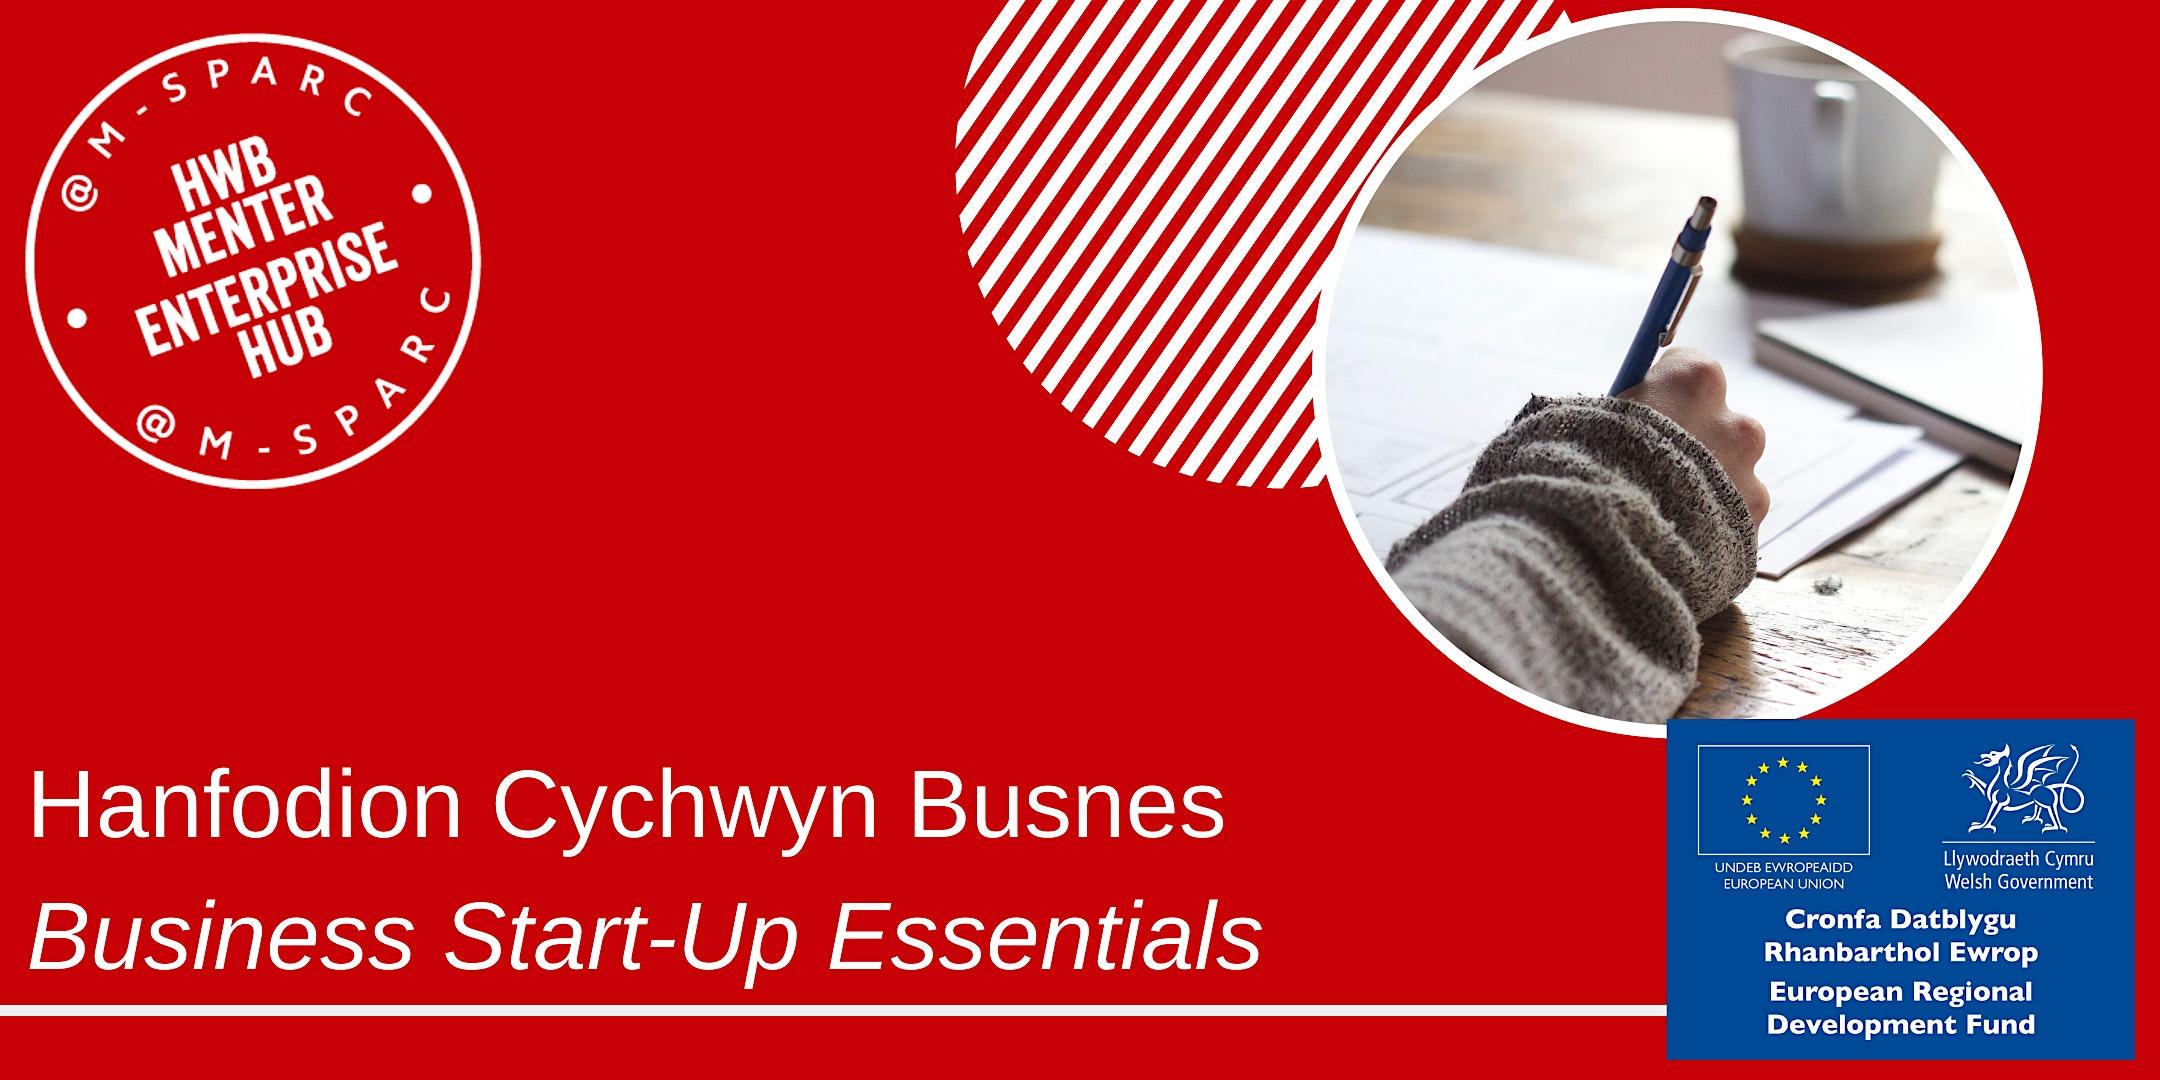 Hanfodion Cychwyn Busnes / Business Start-Up Essentials